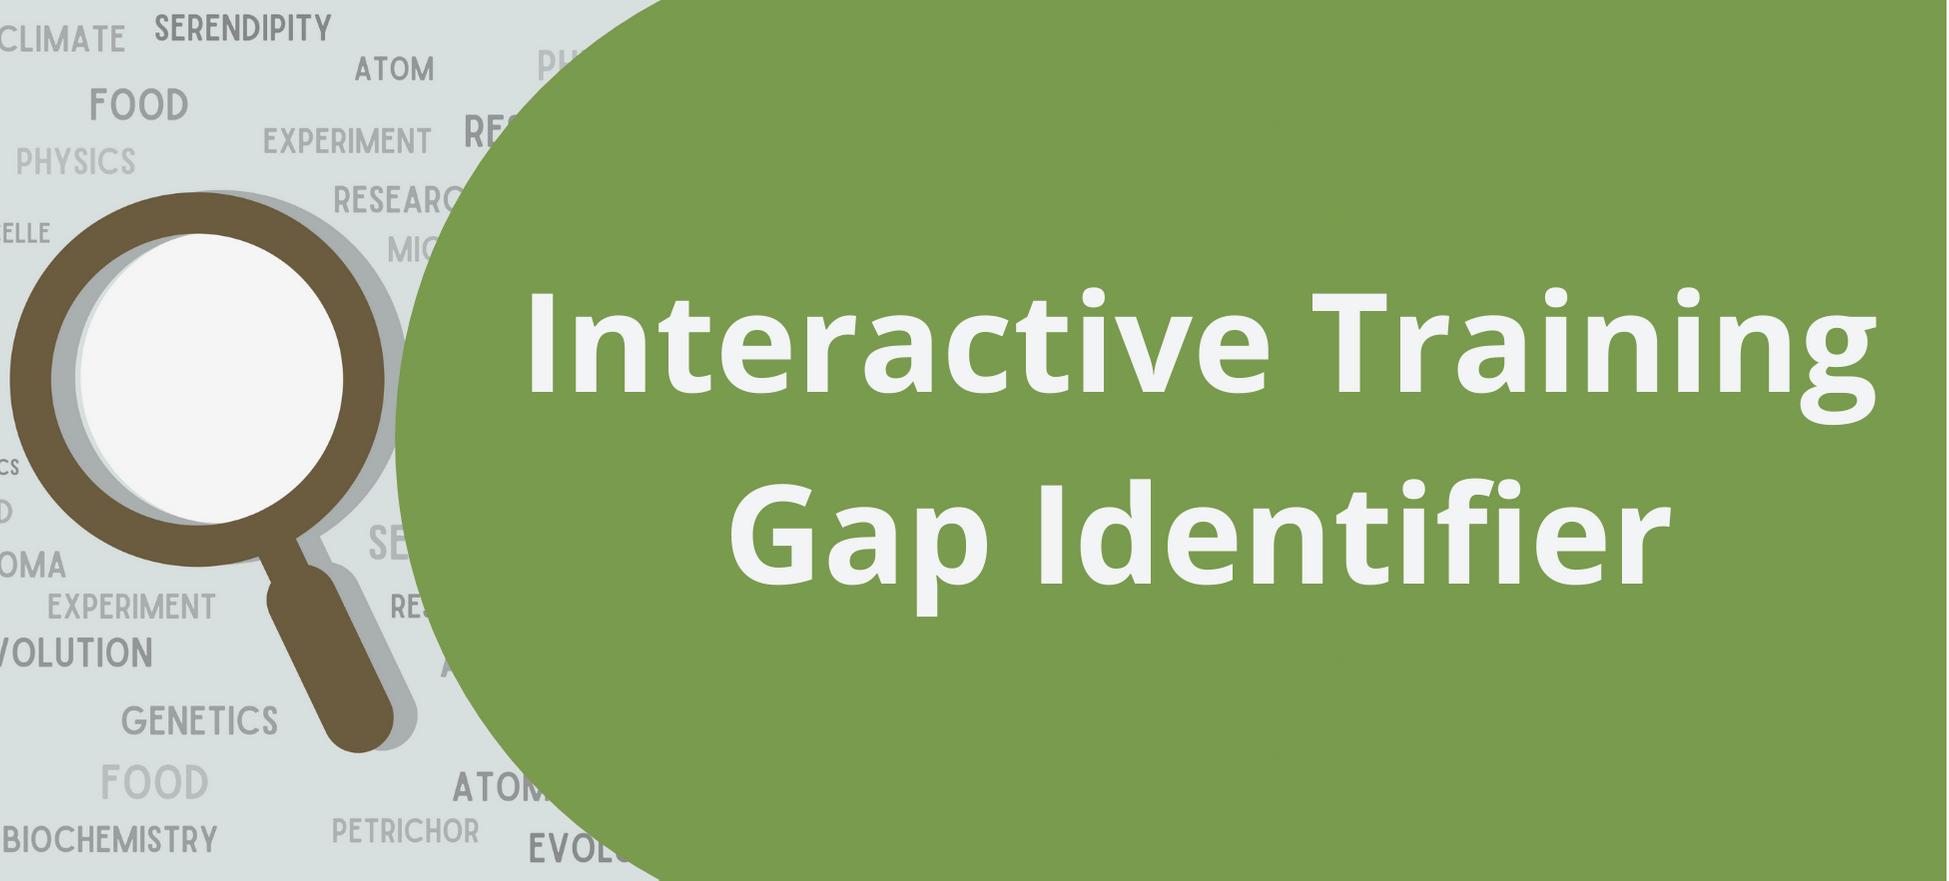 Interactive Trainign Gap Identifier Tool